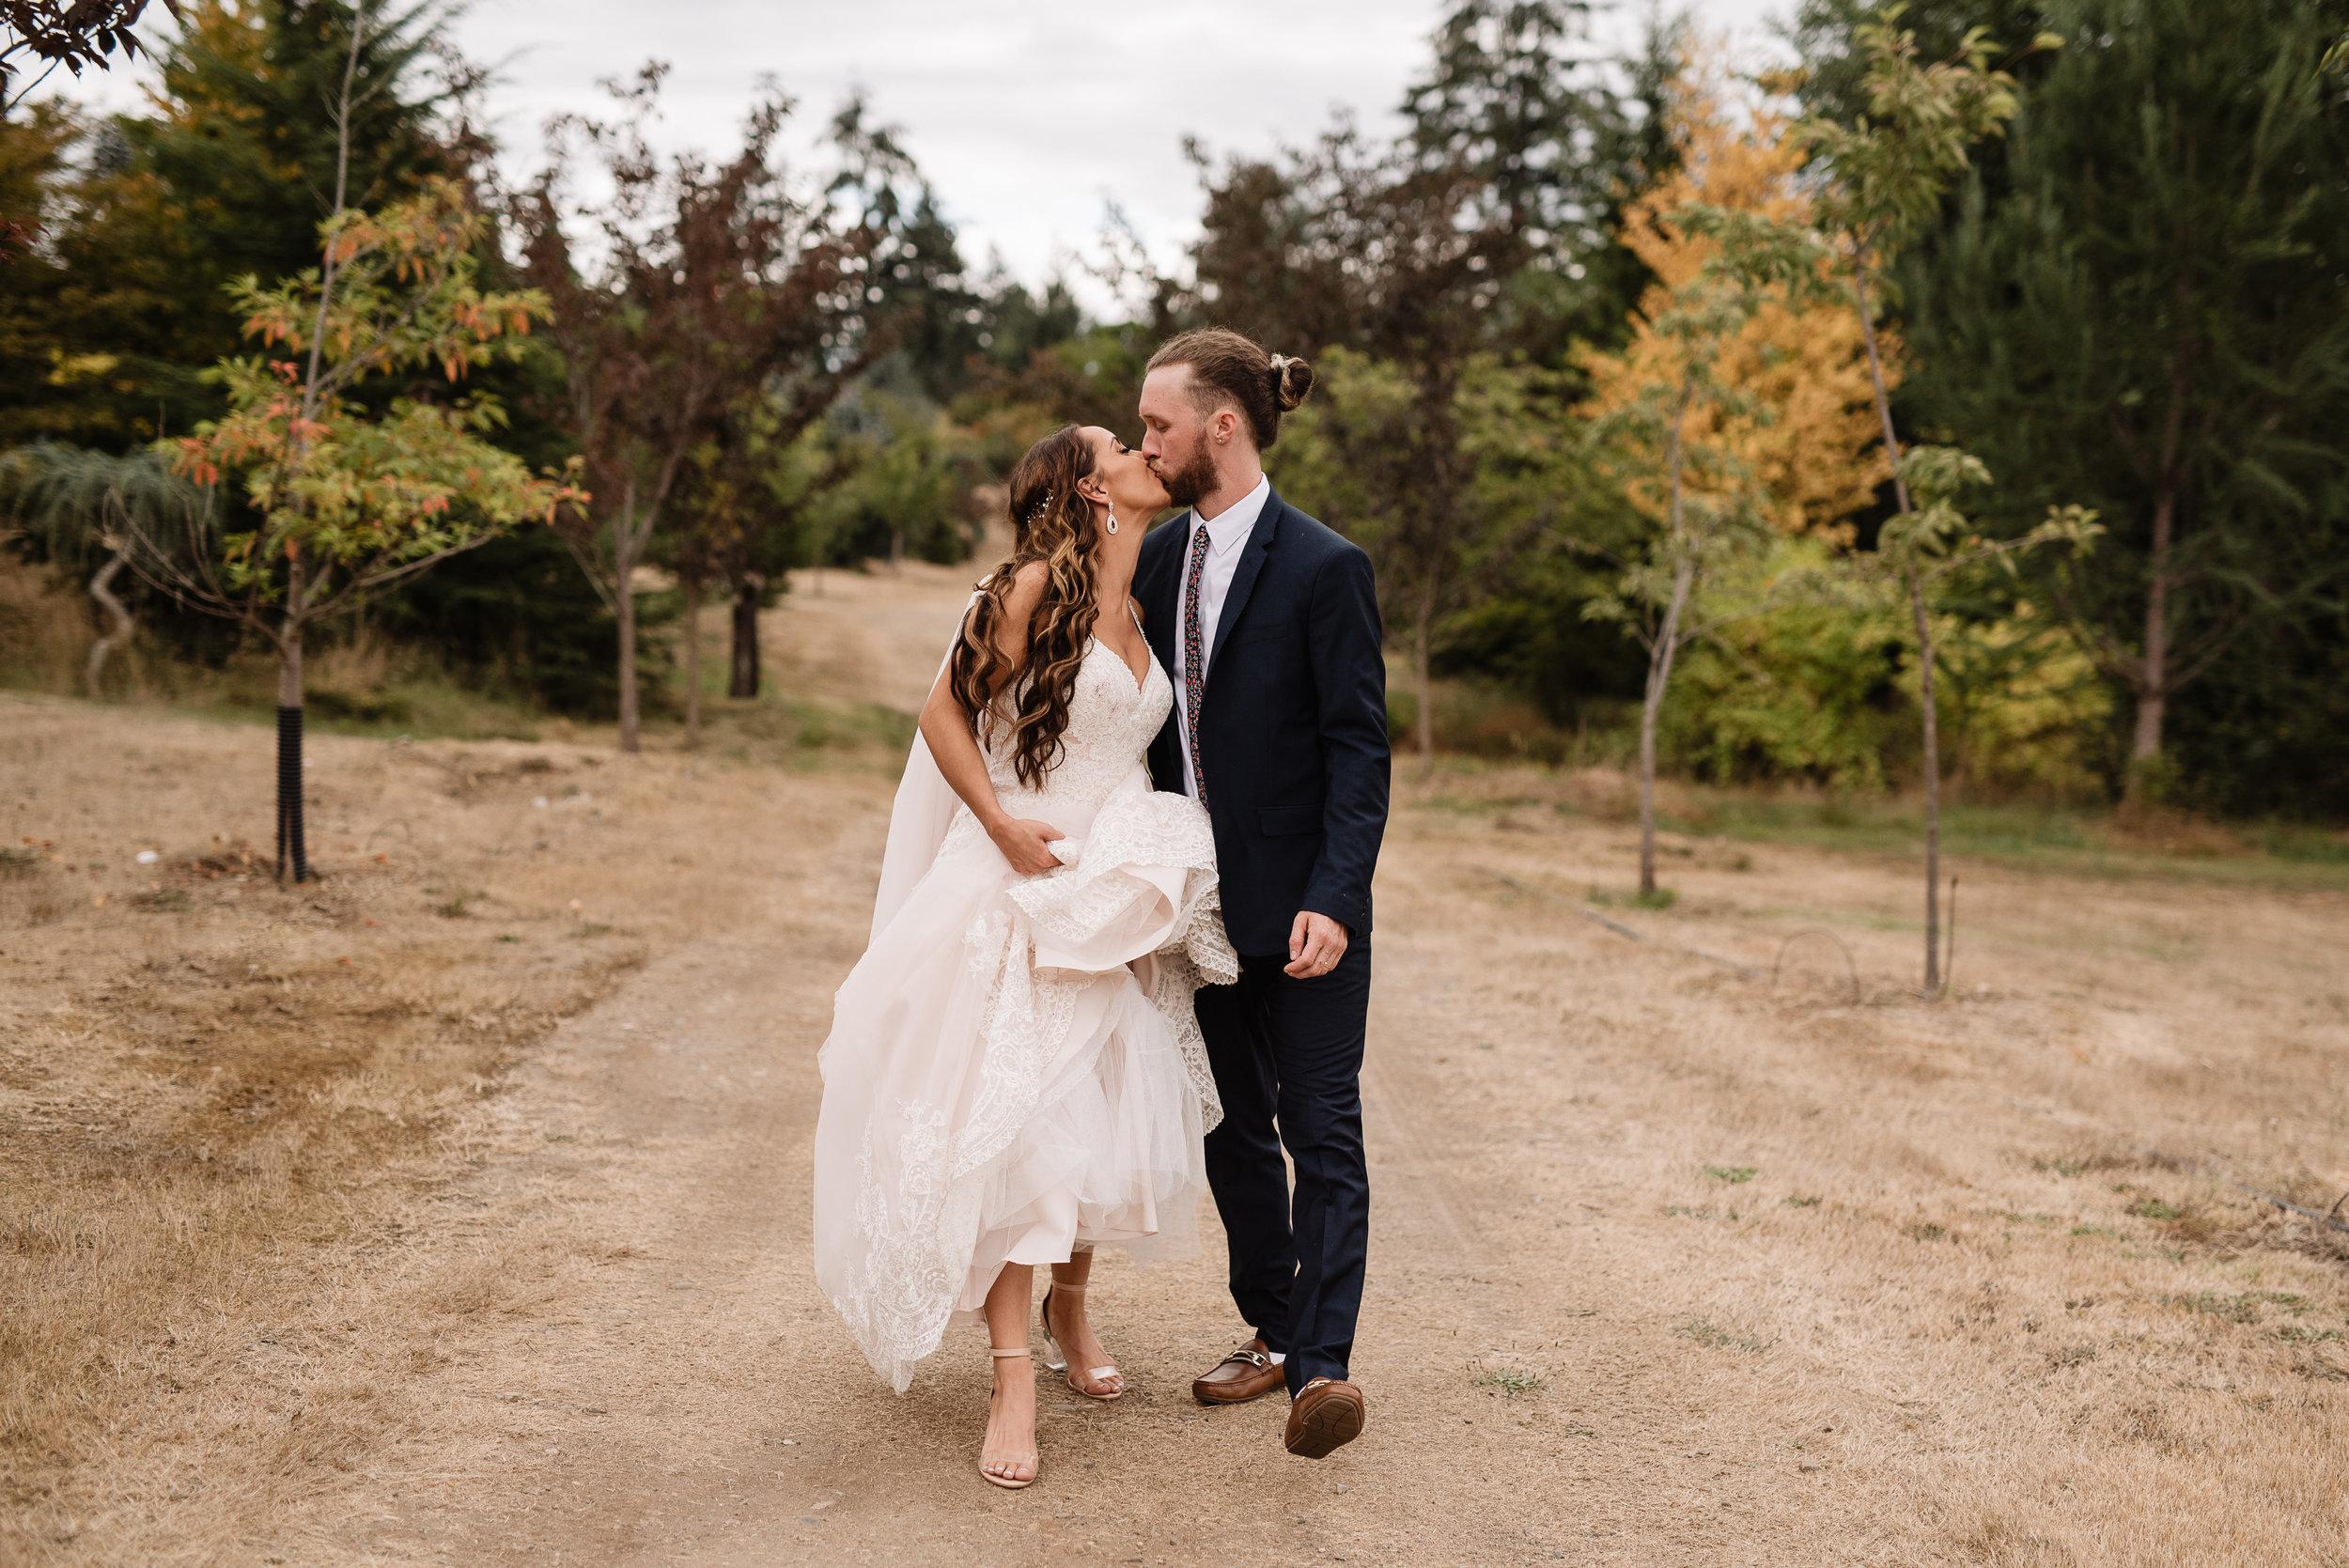 SeattleWeddingPhotographyer_YangsGarden_WeddingVenue_PortOrchard